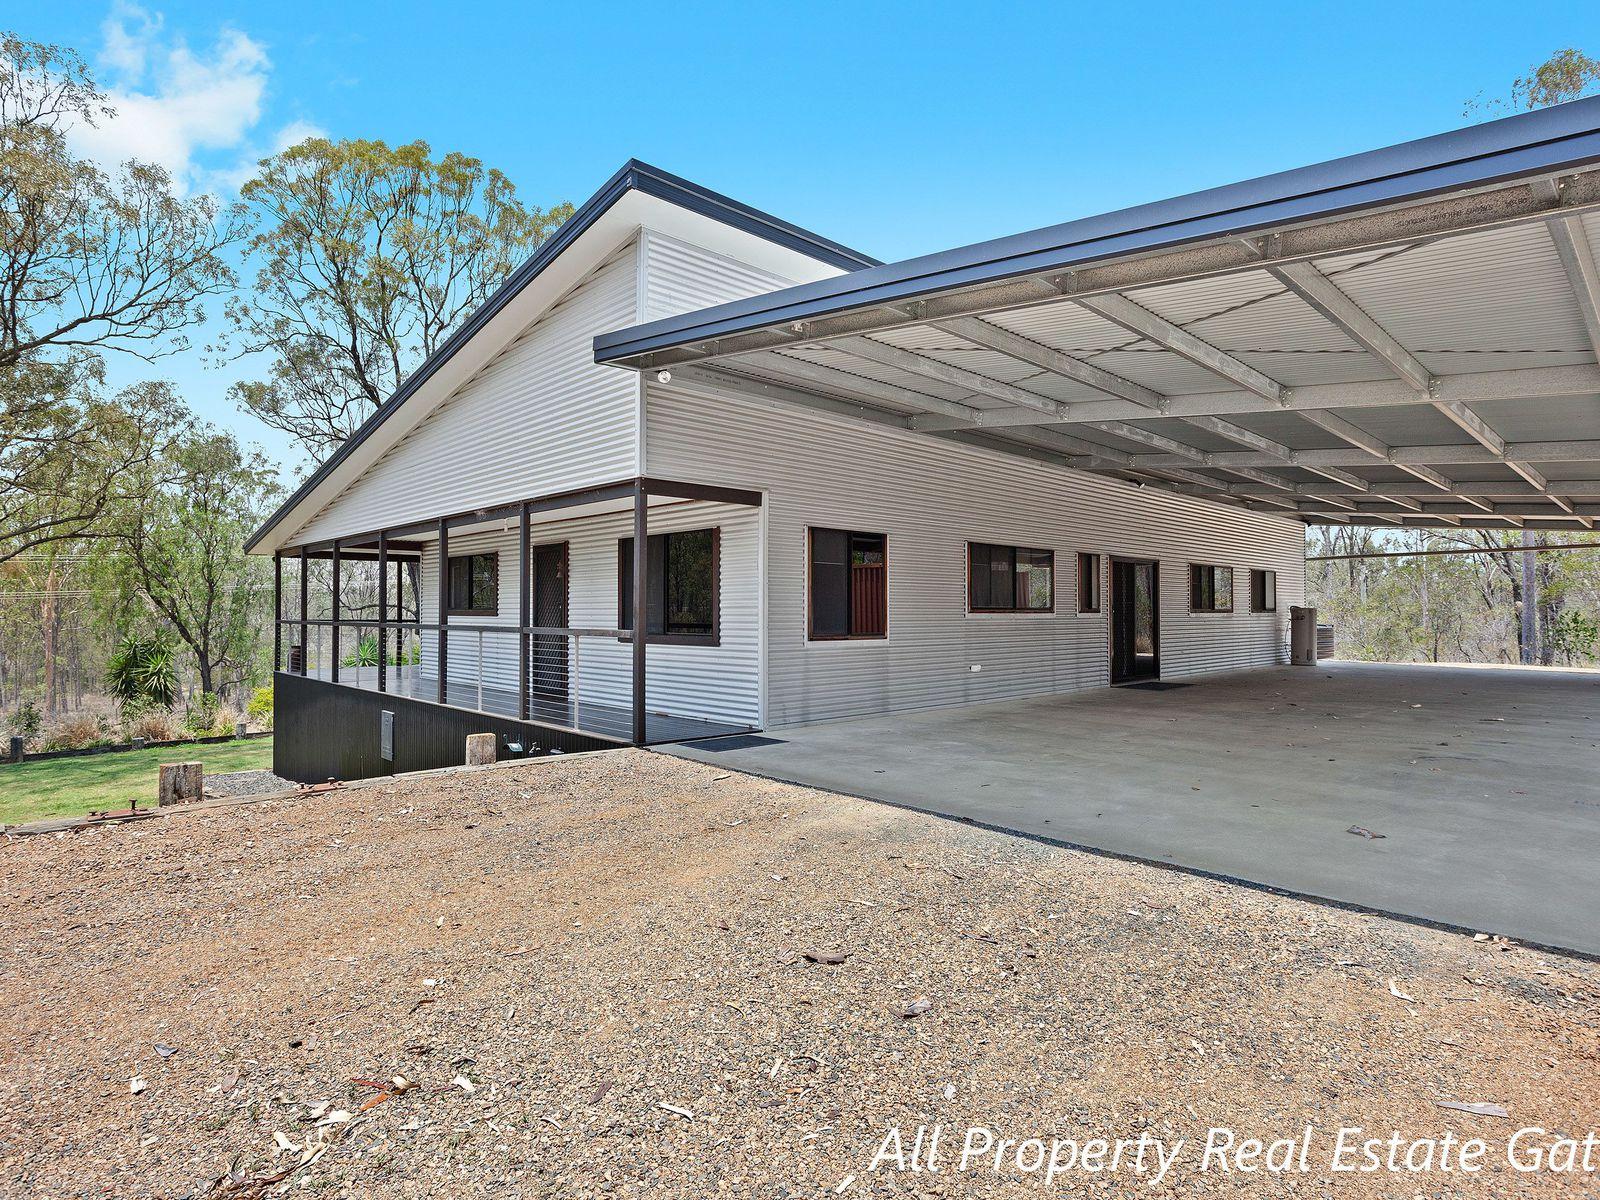 56 Rangeview Drive, Gatton